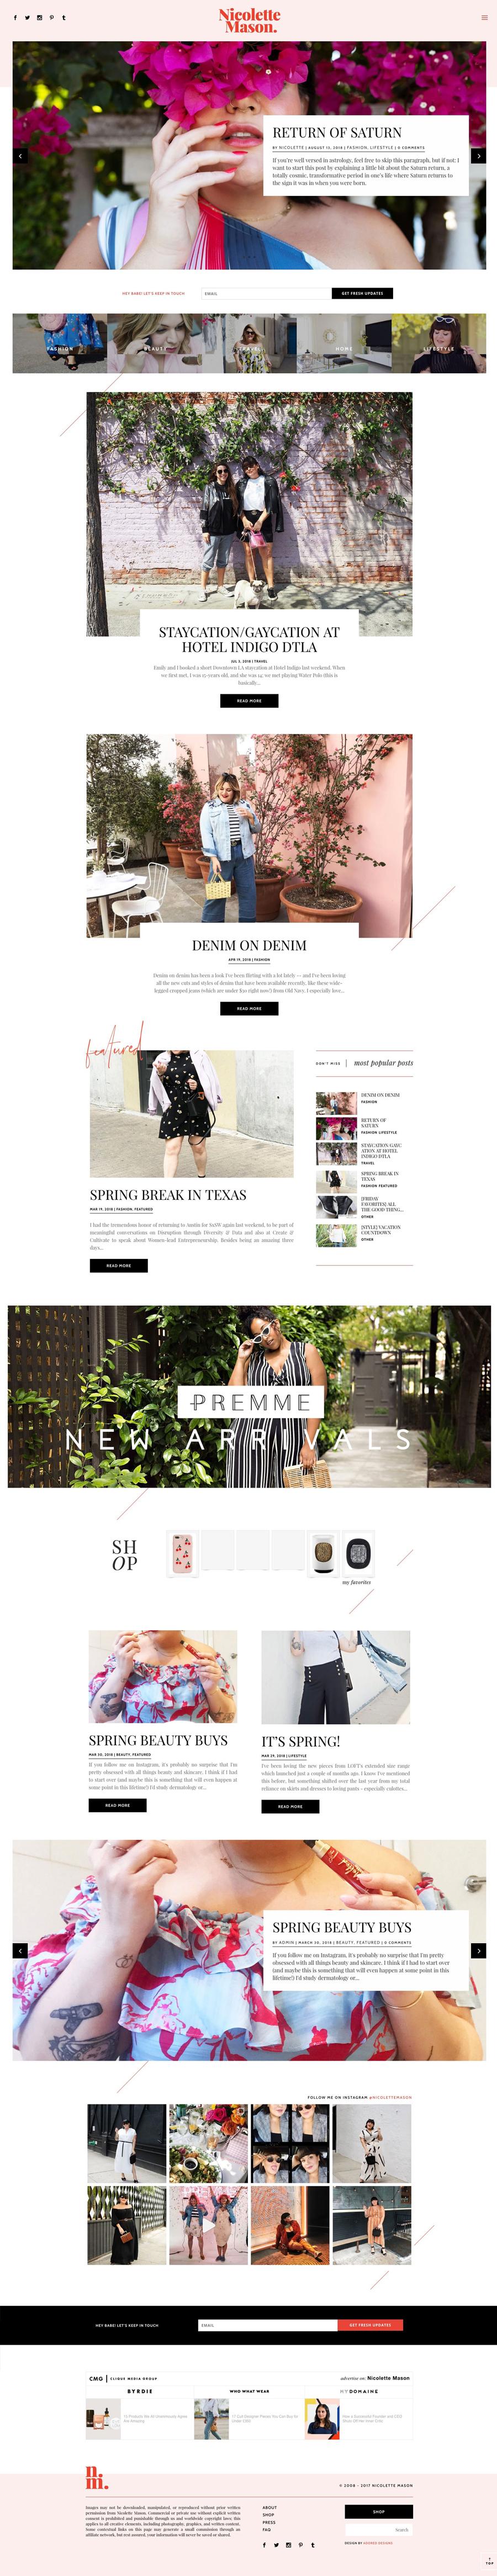 Alyssa Taliaferro - Lifestyle Blogger design on WordPress Adored Designs